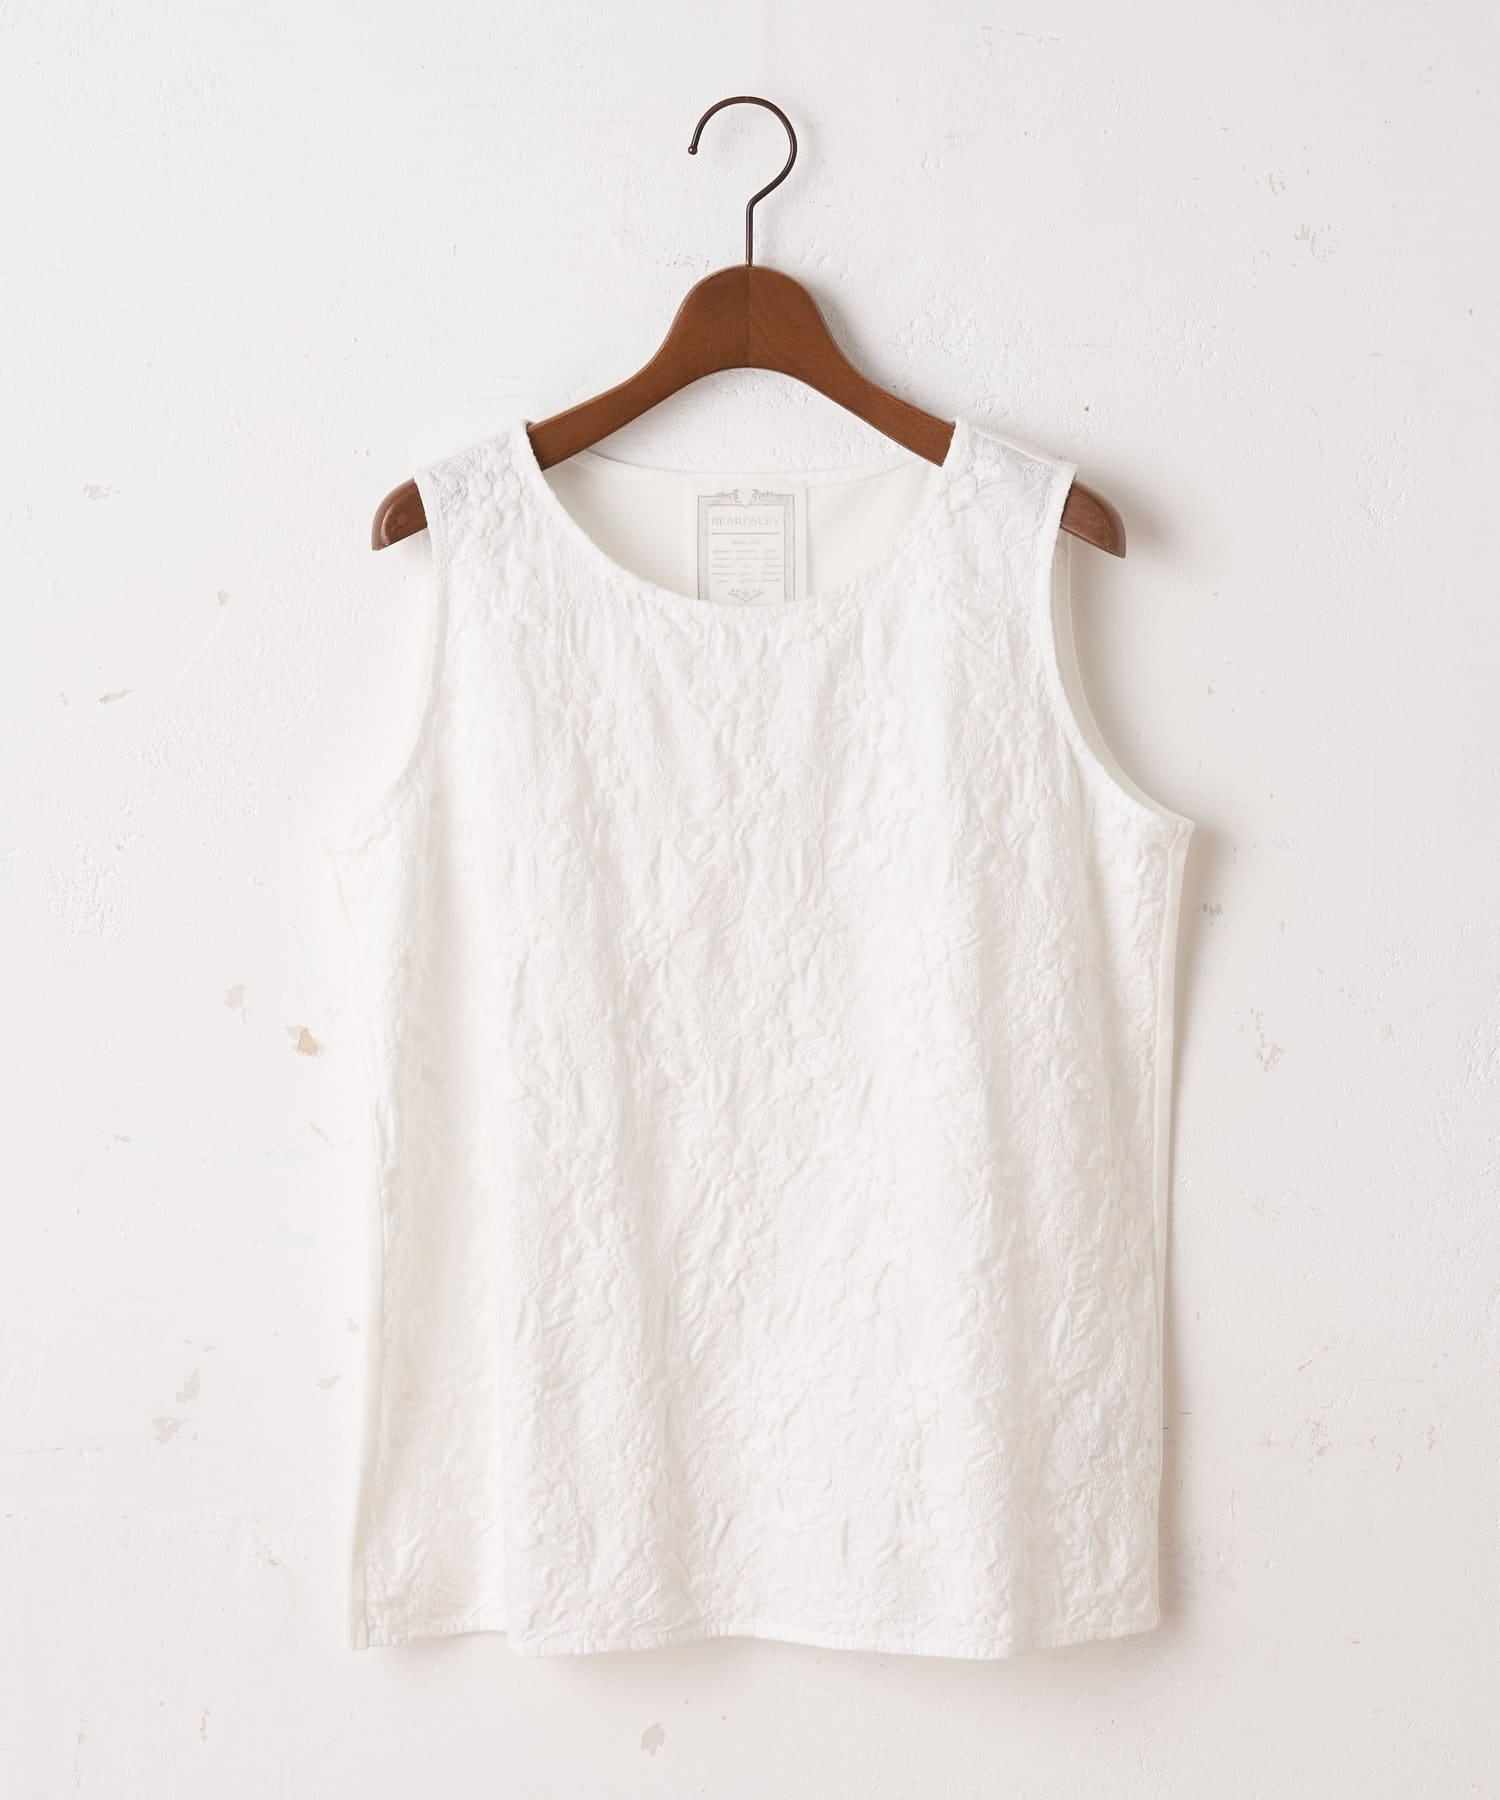 BEARDSLEY(ビアズリー) ライフスタイル 《BA×embroidery》刺繍タンク ホワイト